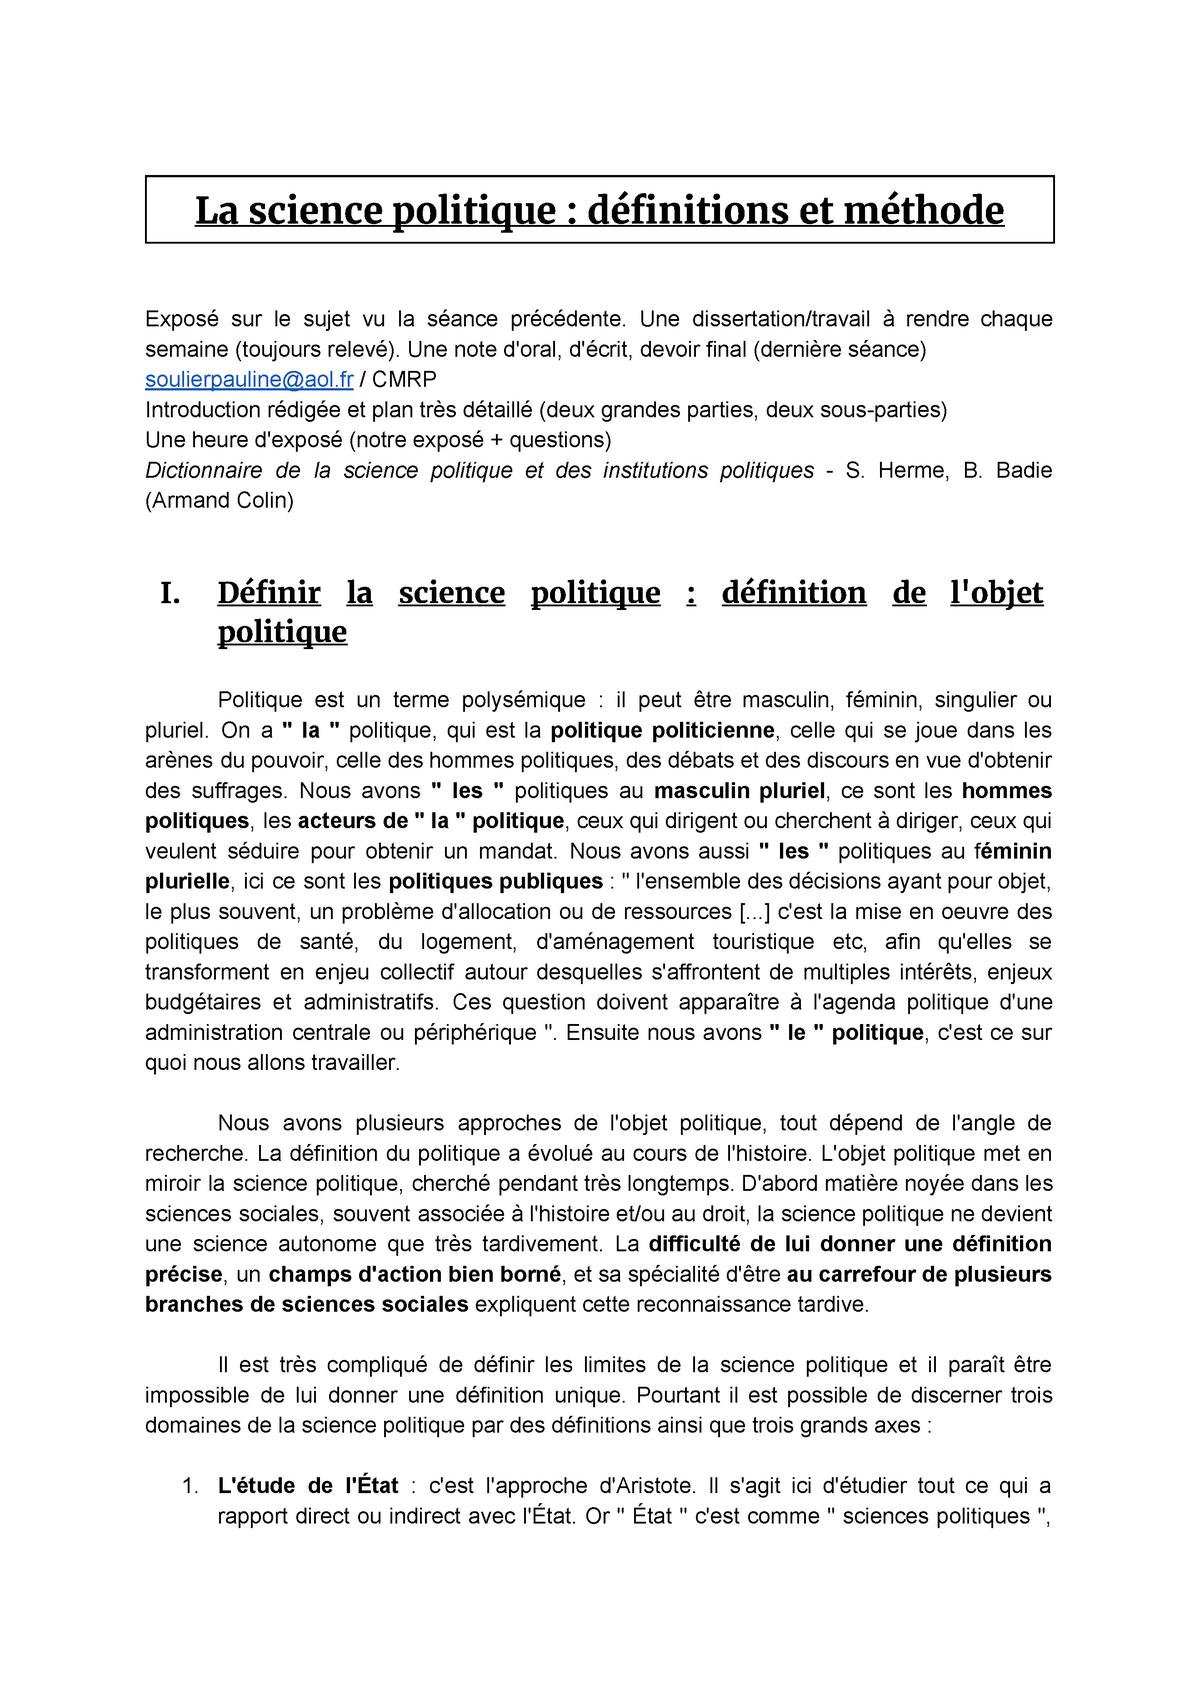 Plan dissertation science politique sample emory supplement essay